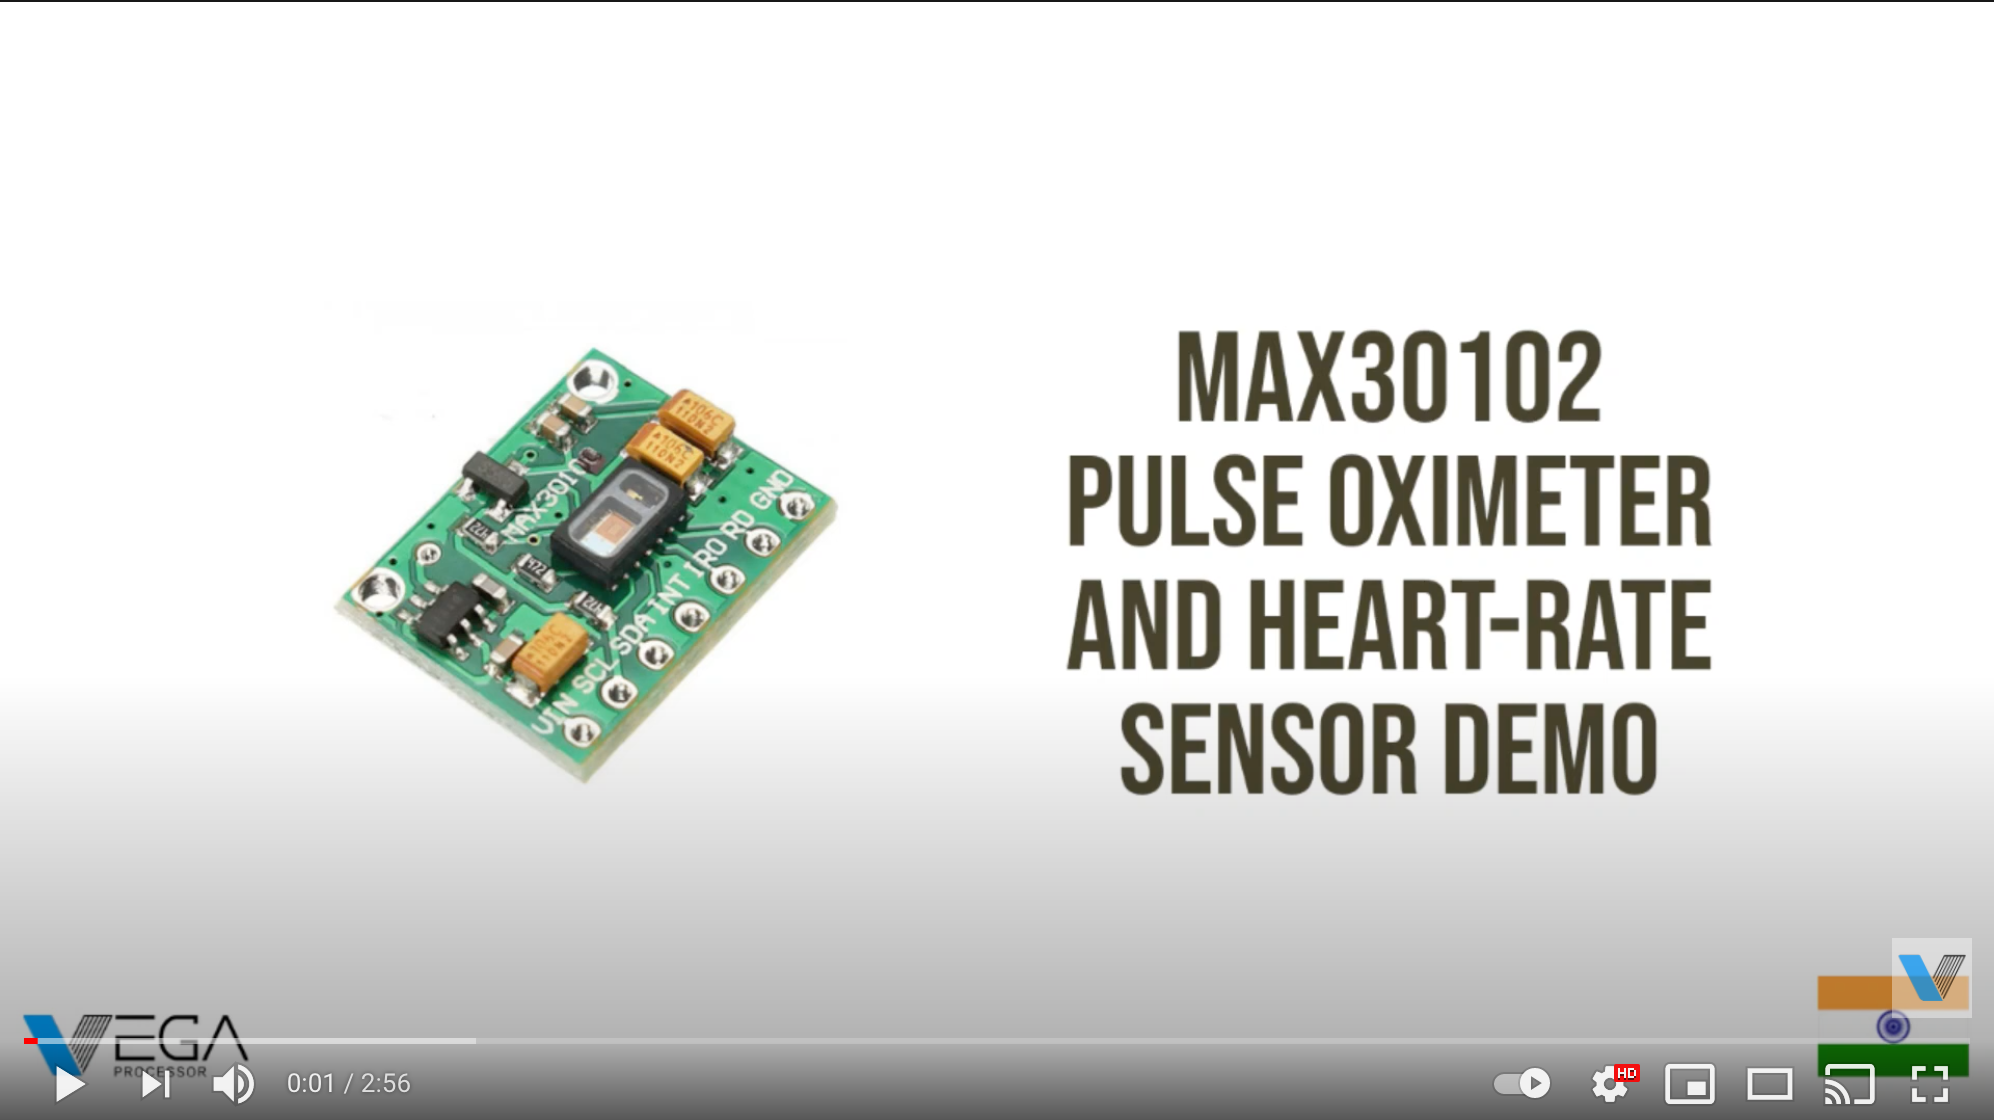 Video: MAX30102 Pulse Oximeter and Heart Rate Sensor Demo using VEGA Processor [ RISC-V ISA]